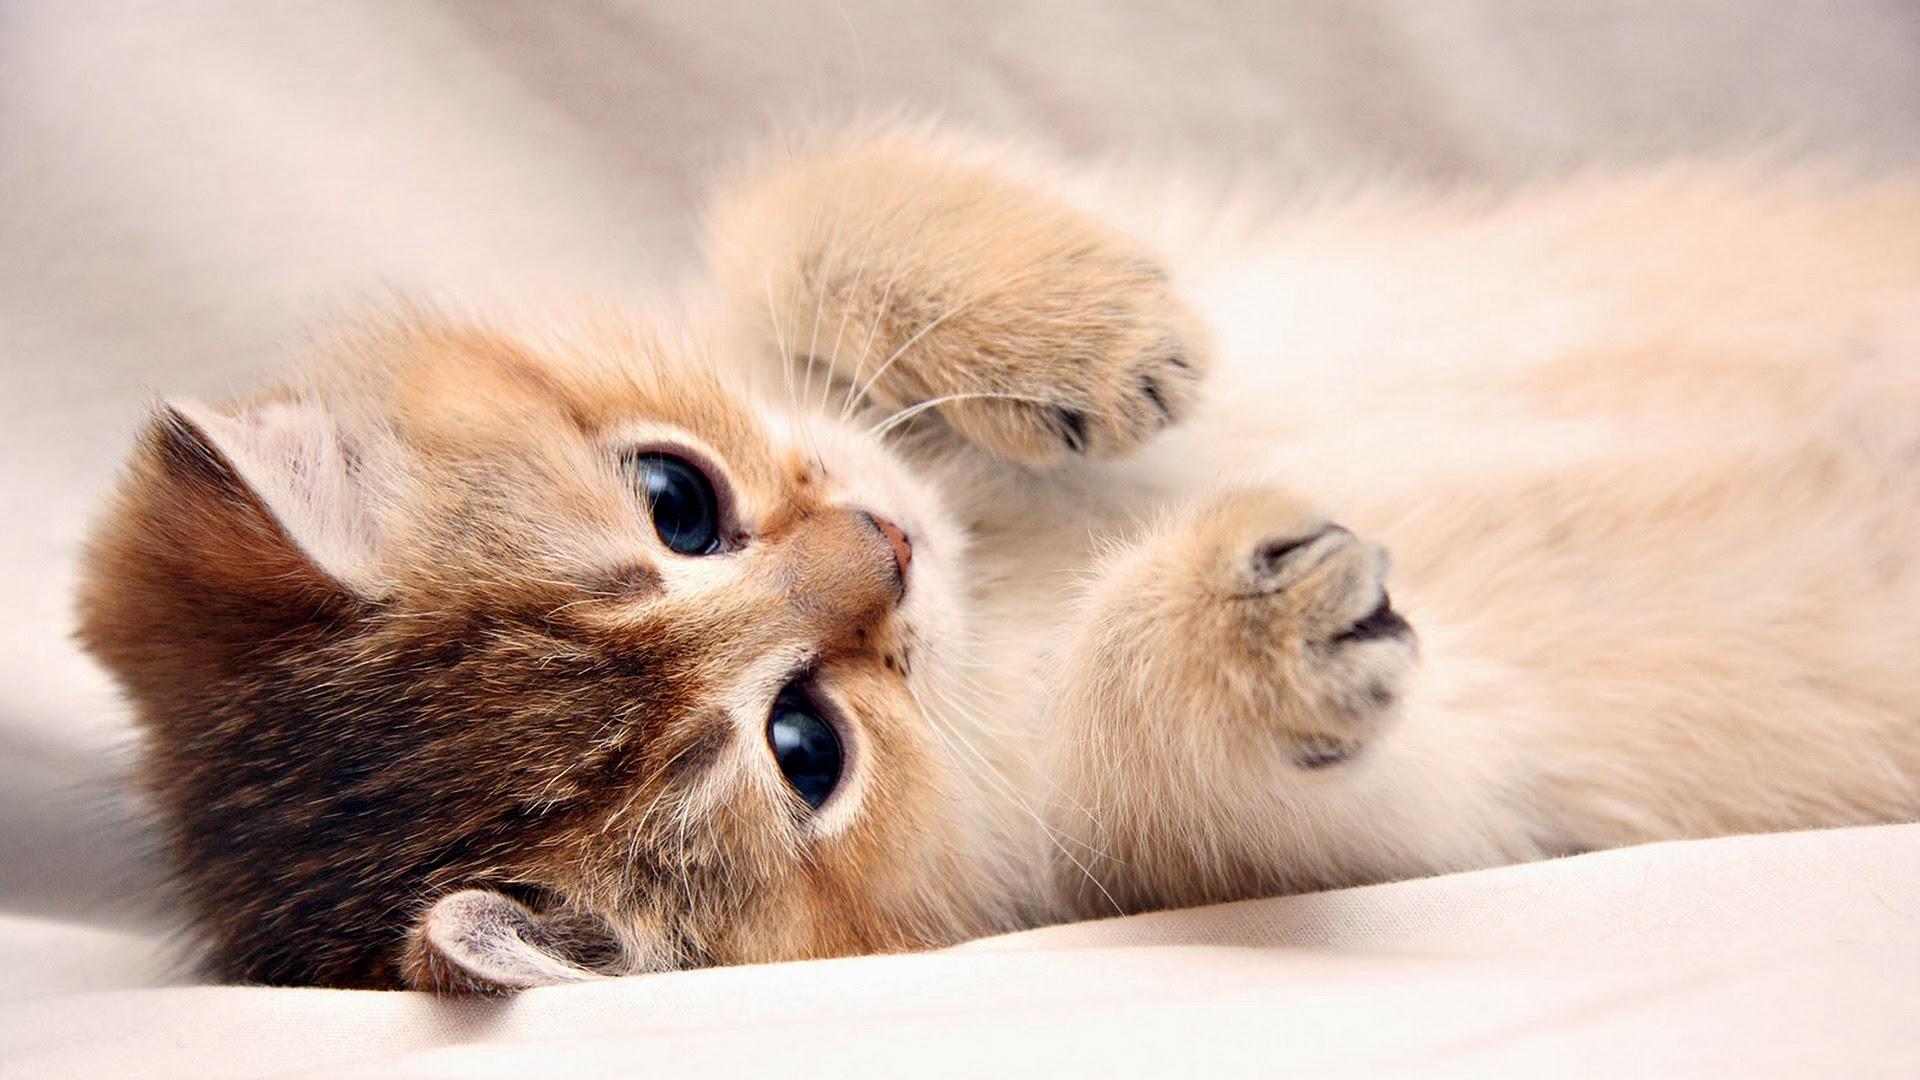 Free Download Cute Cat Wallpaper Cute Kitten Cat Hd Wallpaper 19202151080 1920x1080 For Your Desktop Mobile Tablet Explore 75 Cute Kitten Wallpapers Cute Wallpaper Kittens Wallpaper Cute Cats Wallpaper